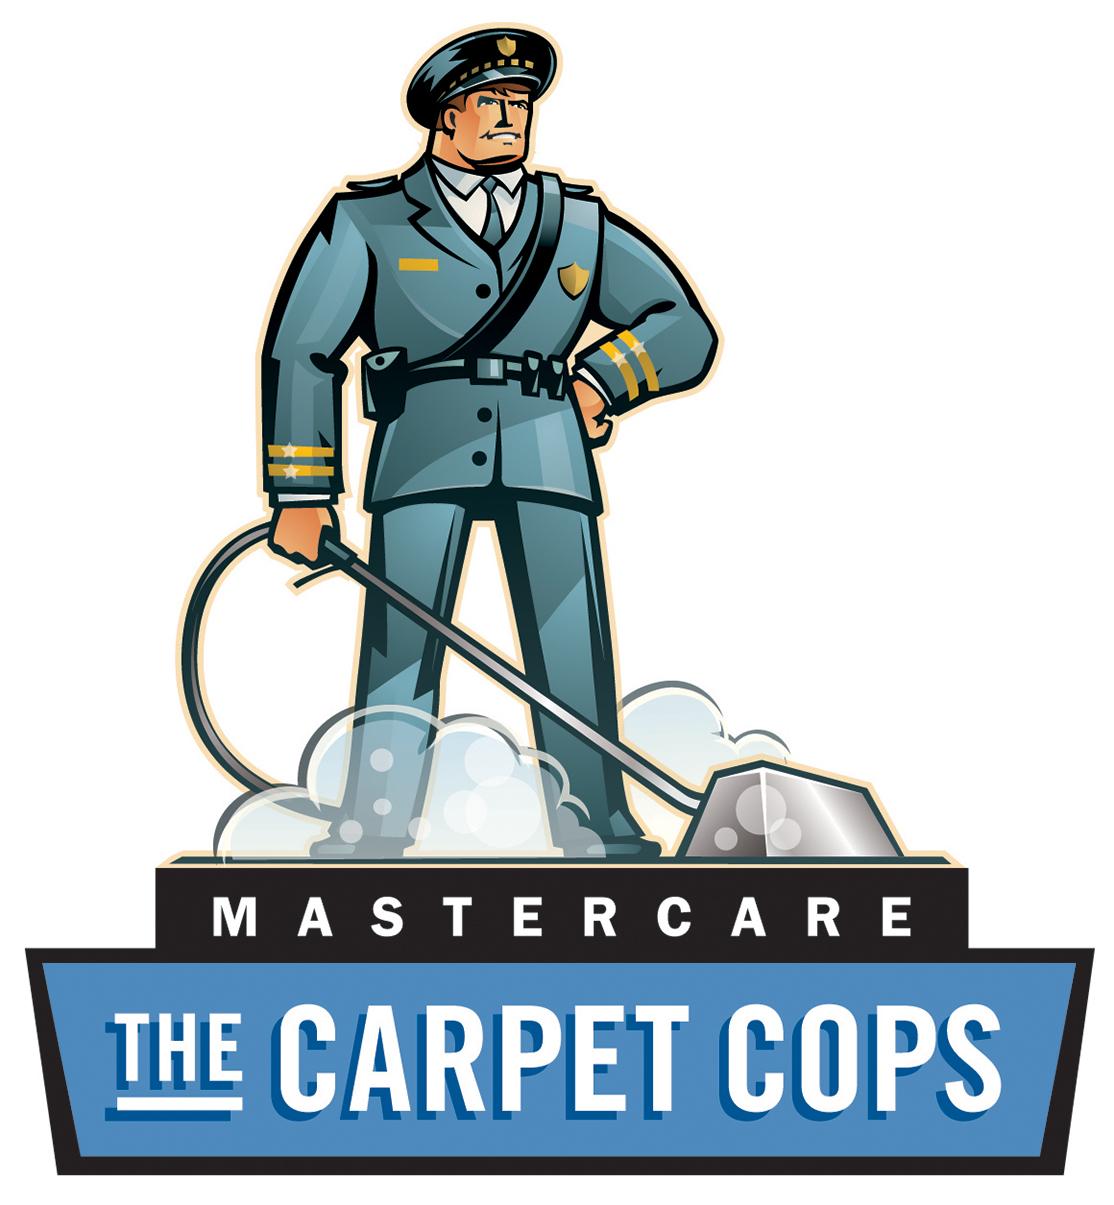 mastercare carpet cleaning san go reviews carpet vidalondon. Black Bedroom Furniture Sets. Home Design Ideas